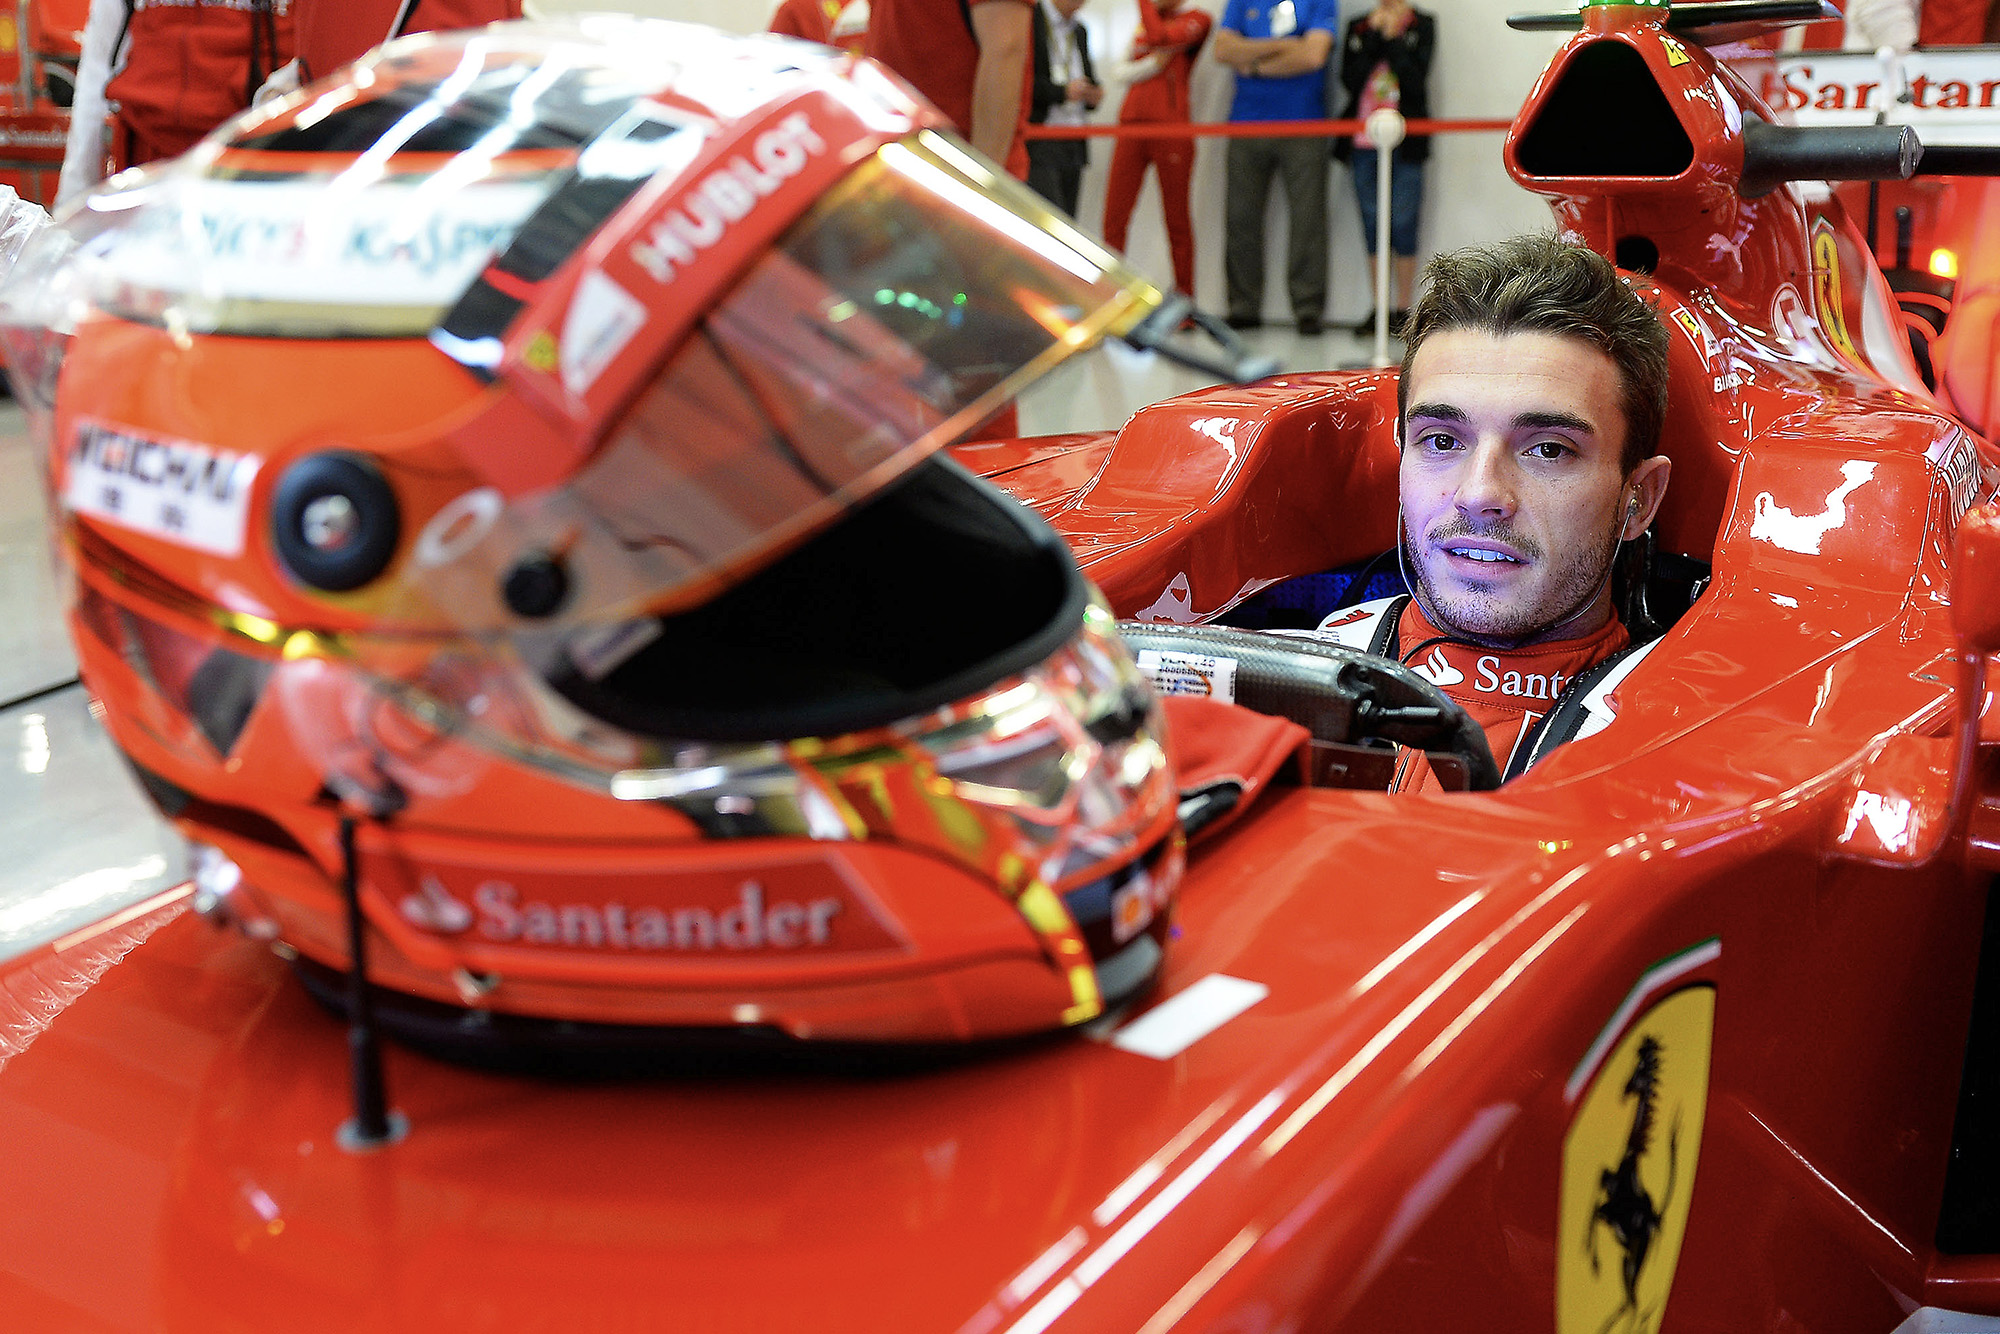 Jules Bianchi in a Ferrari during 2014 F1 testing at Silverstone